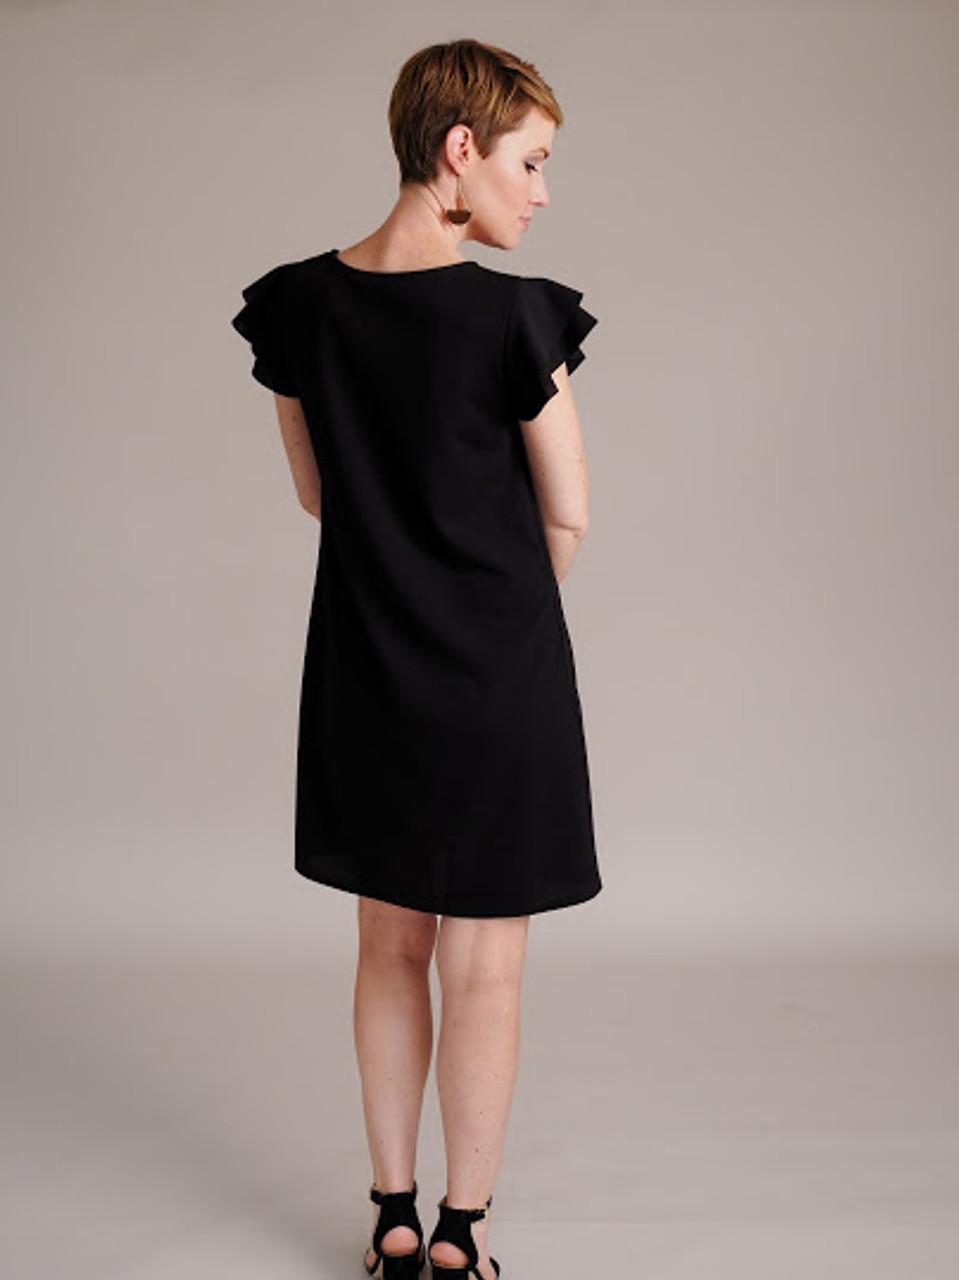 Ruffled Short Sleeve Dress